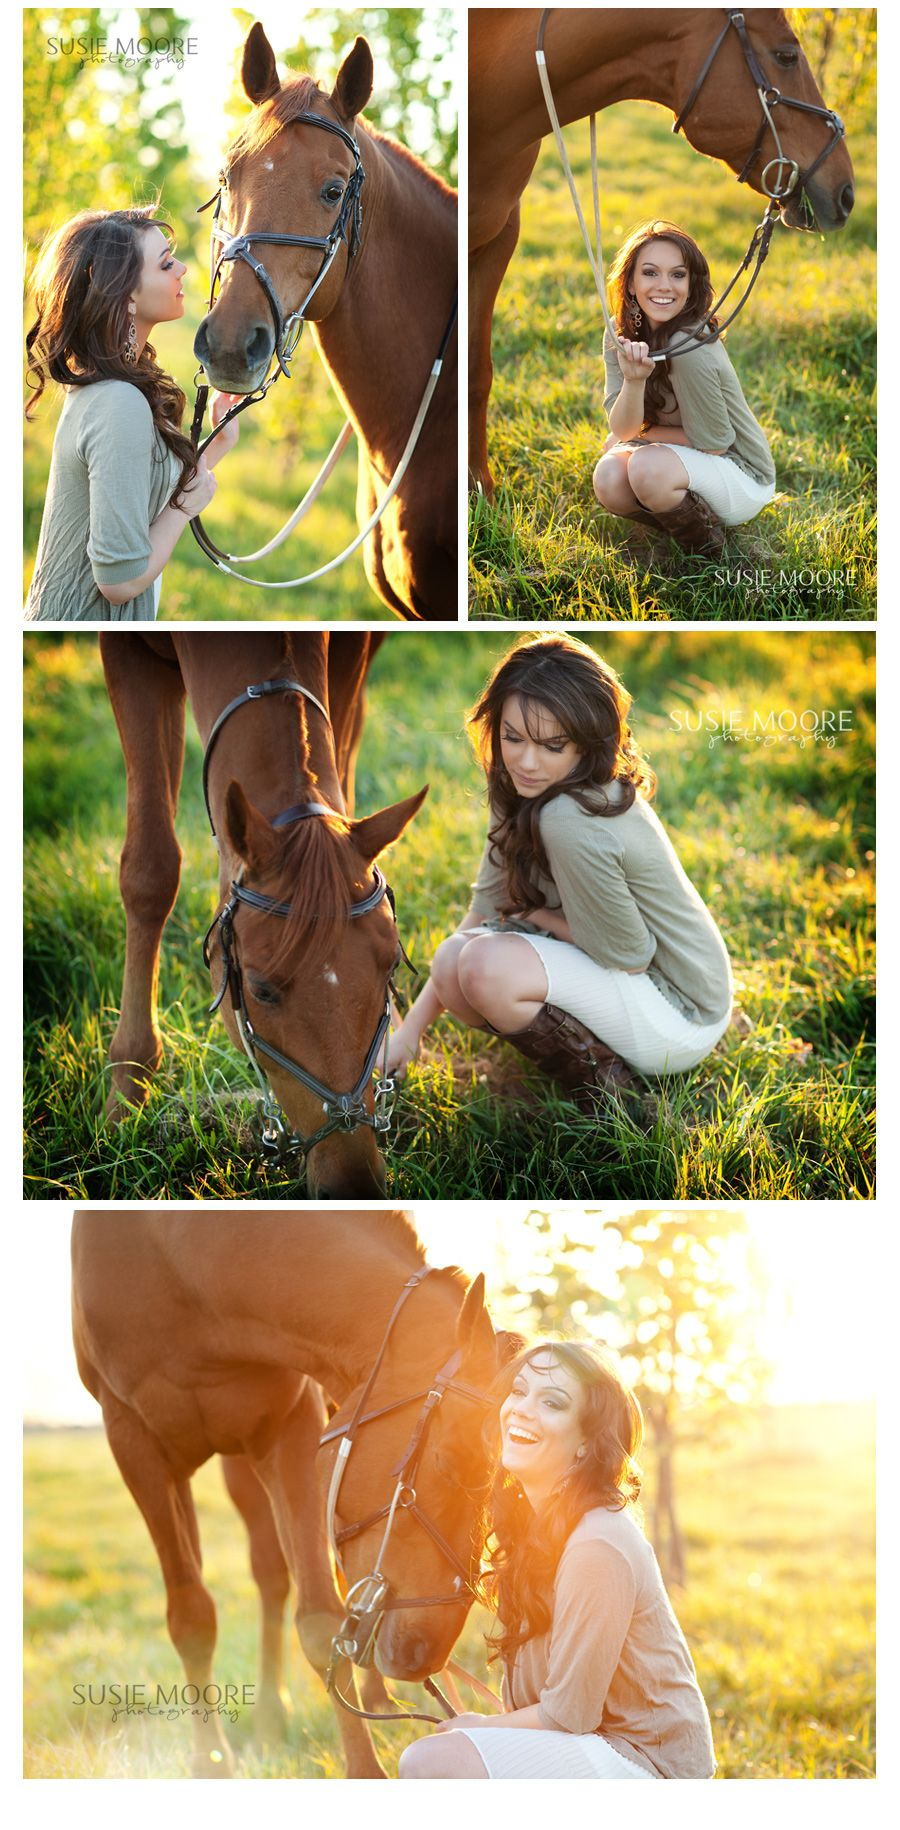 Senior Portrait Ideas | Pet | Photography | Horse | Photo Session Inspiration | Pose Idea | Poses